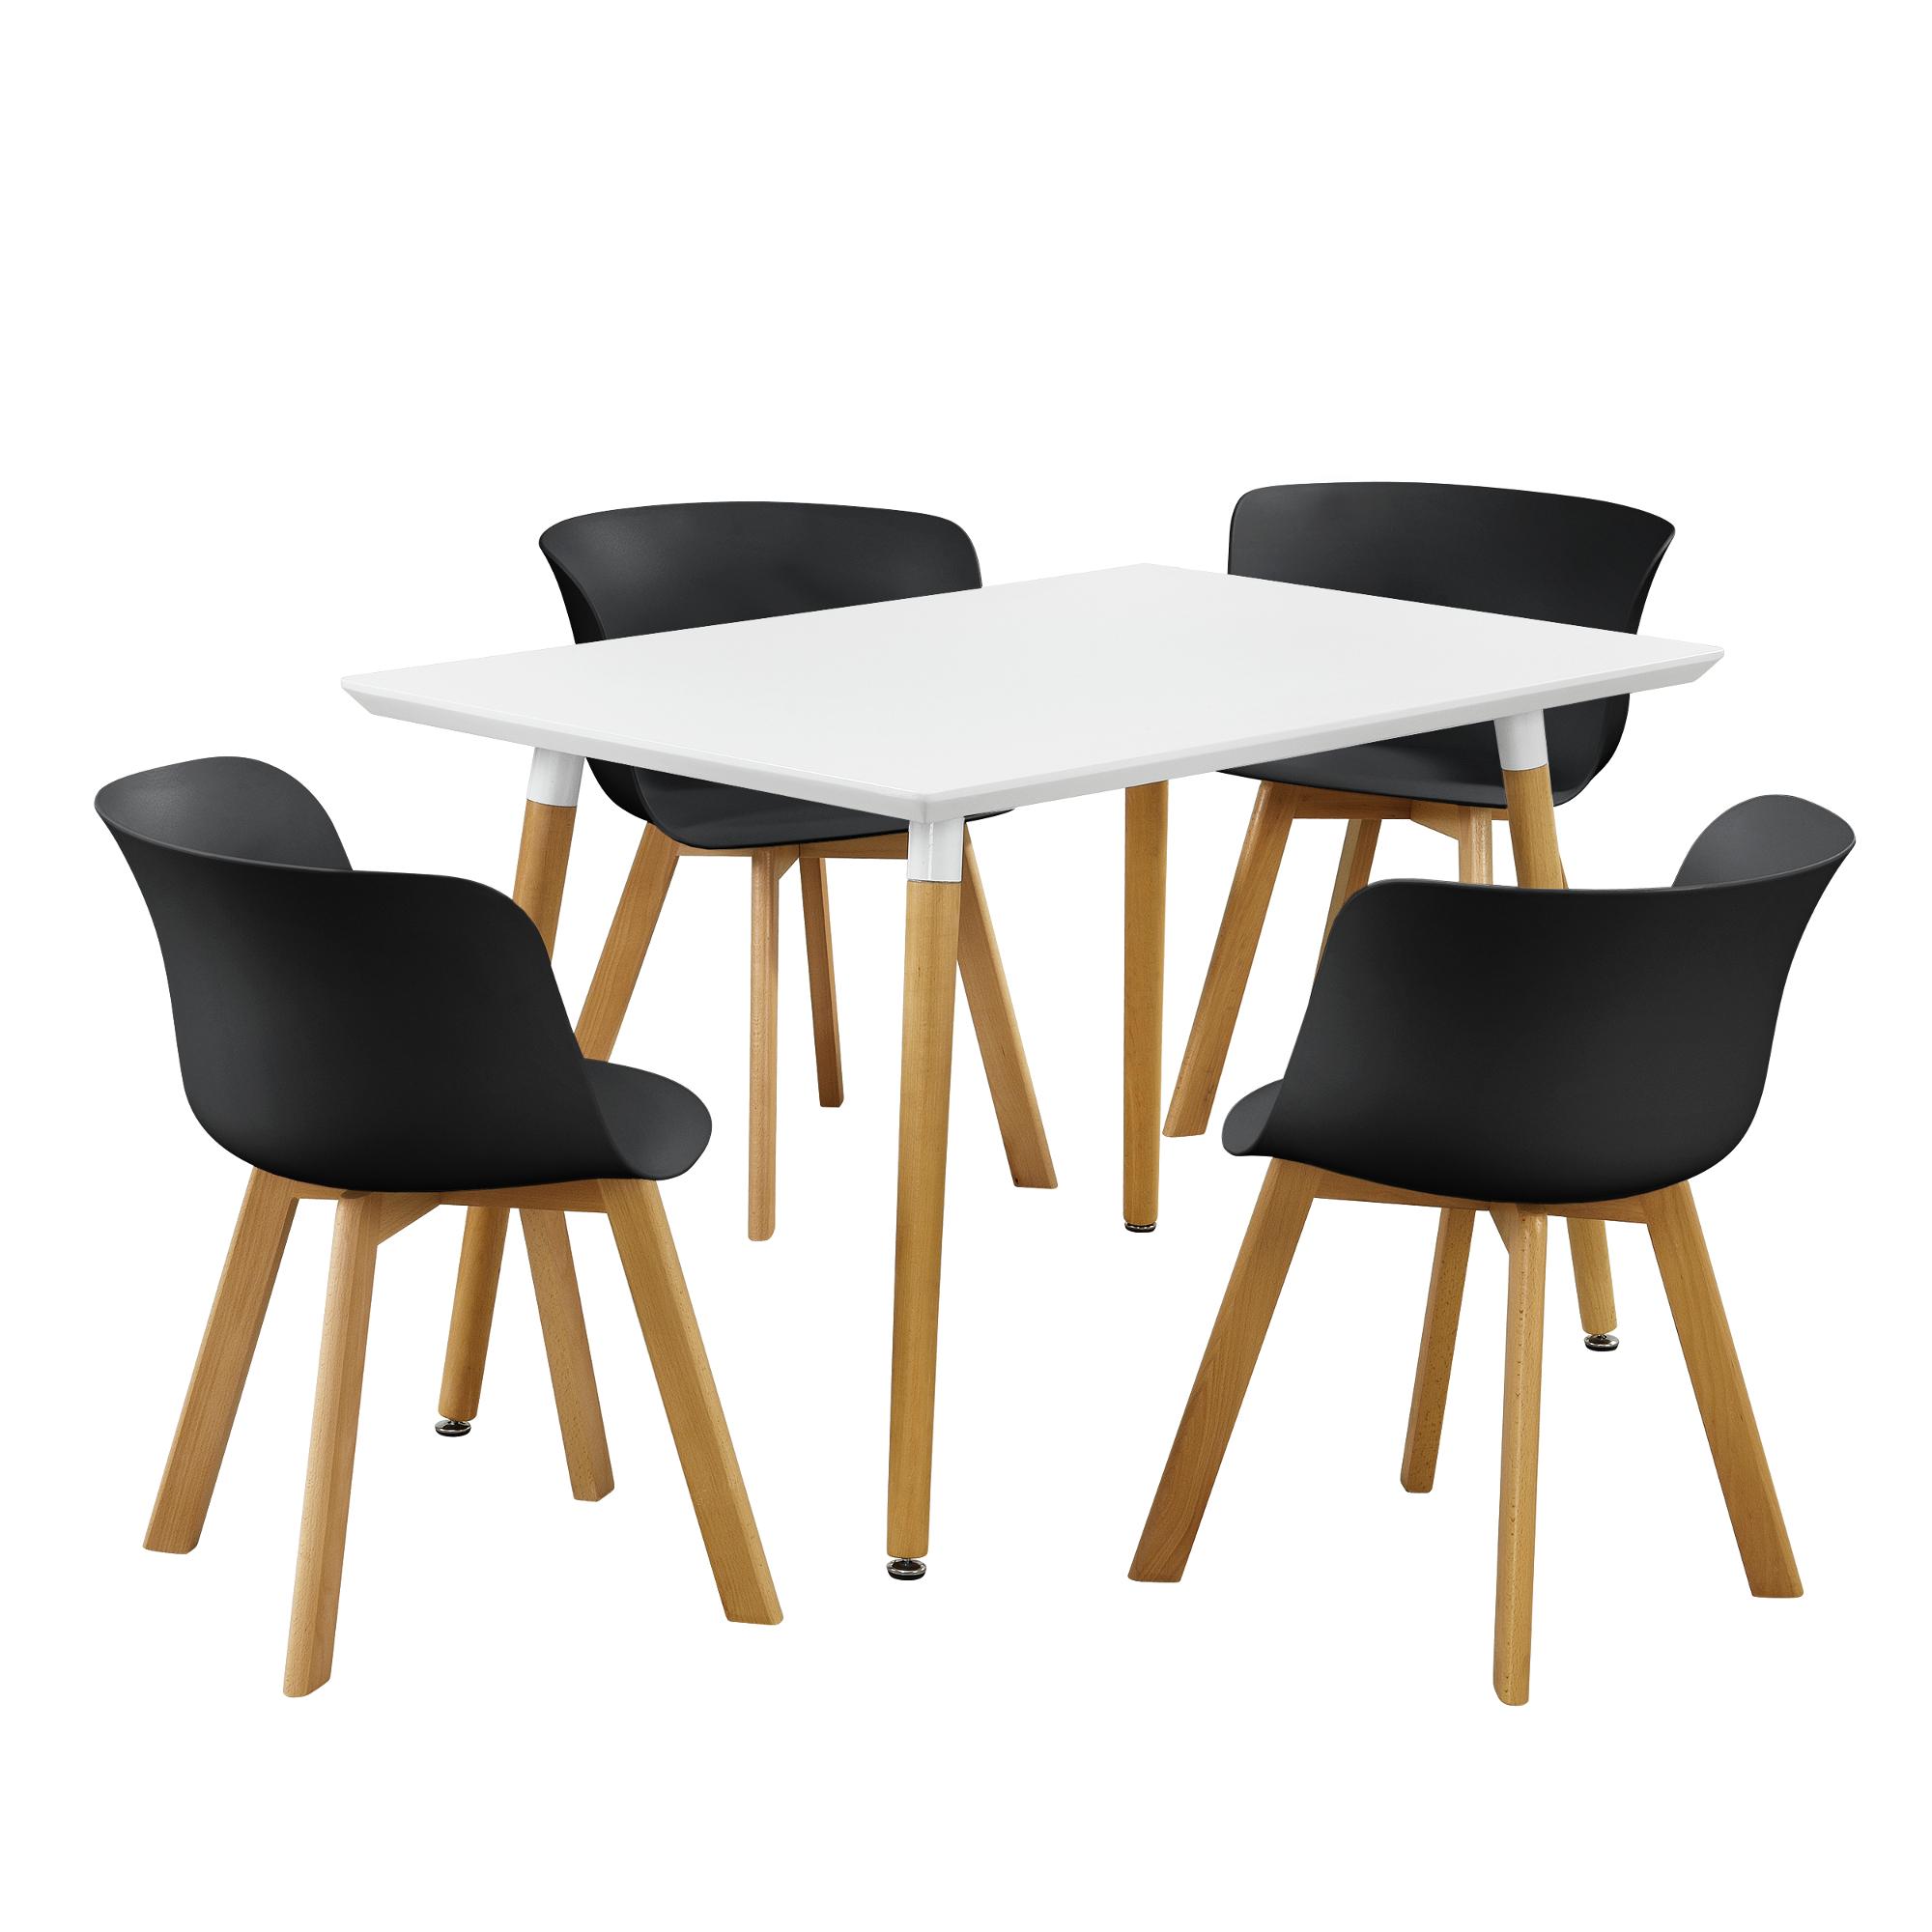 Ebay sedie cucina sedie moderne cucina soggiorno bar pr - Sedie cucina ebay ...